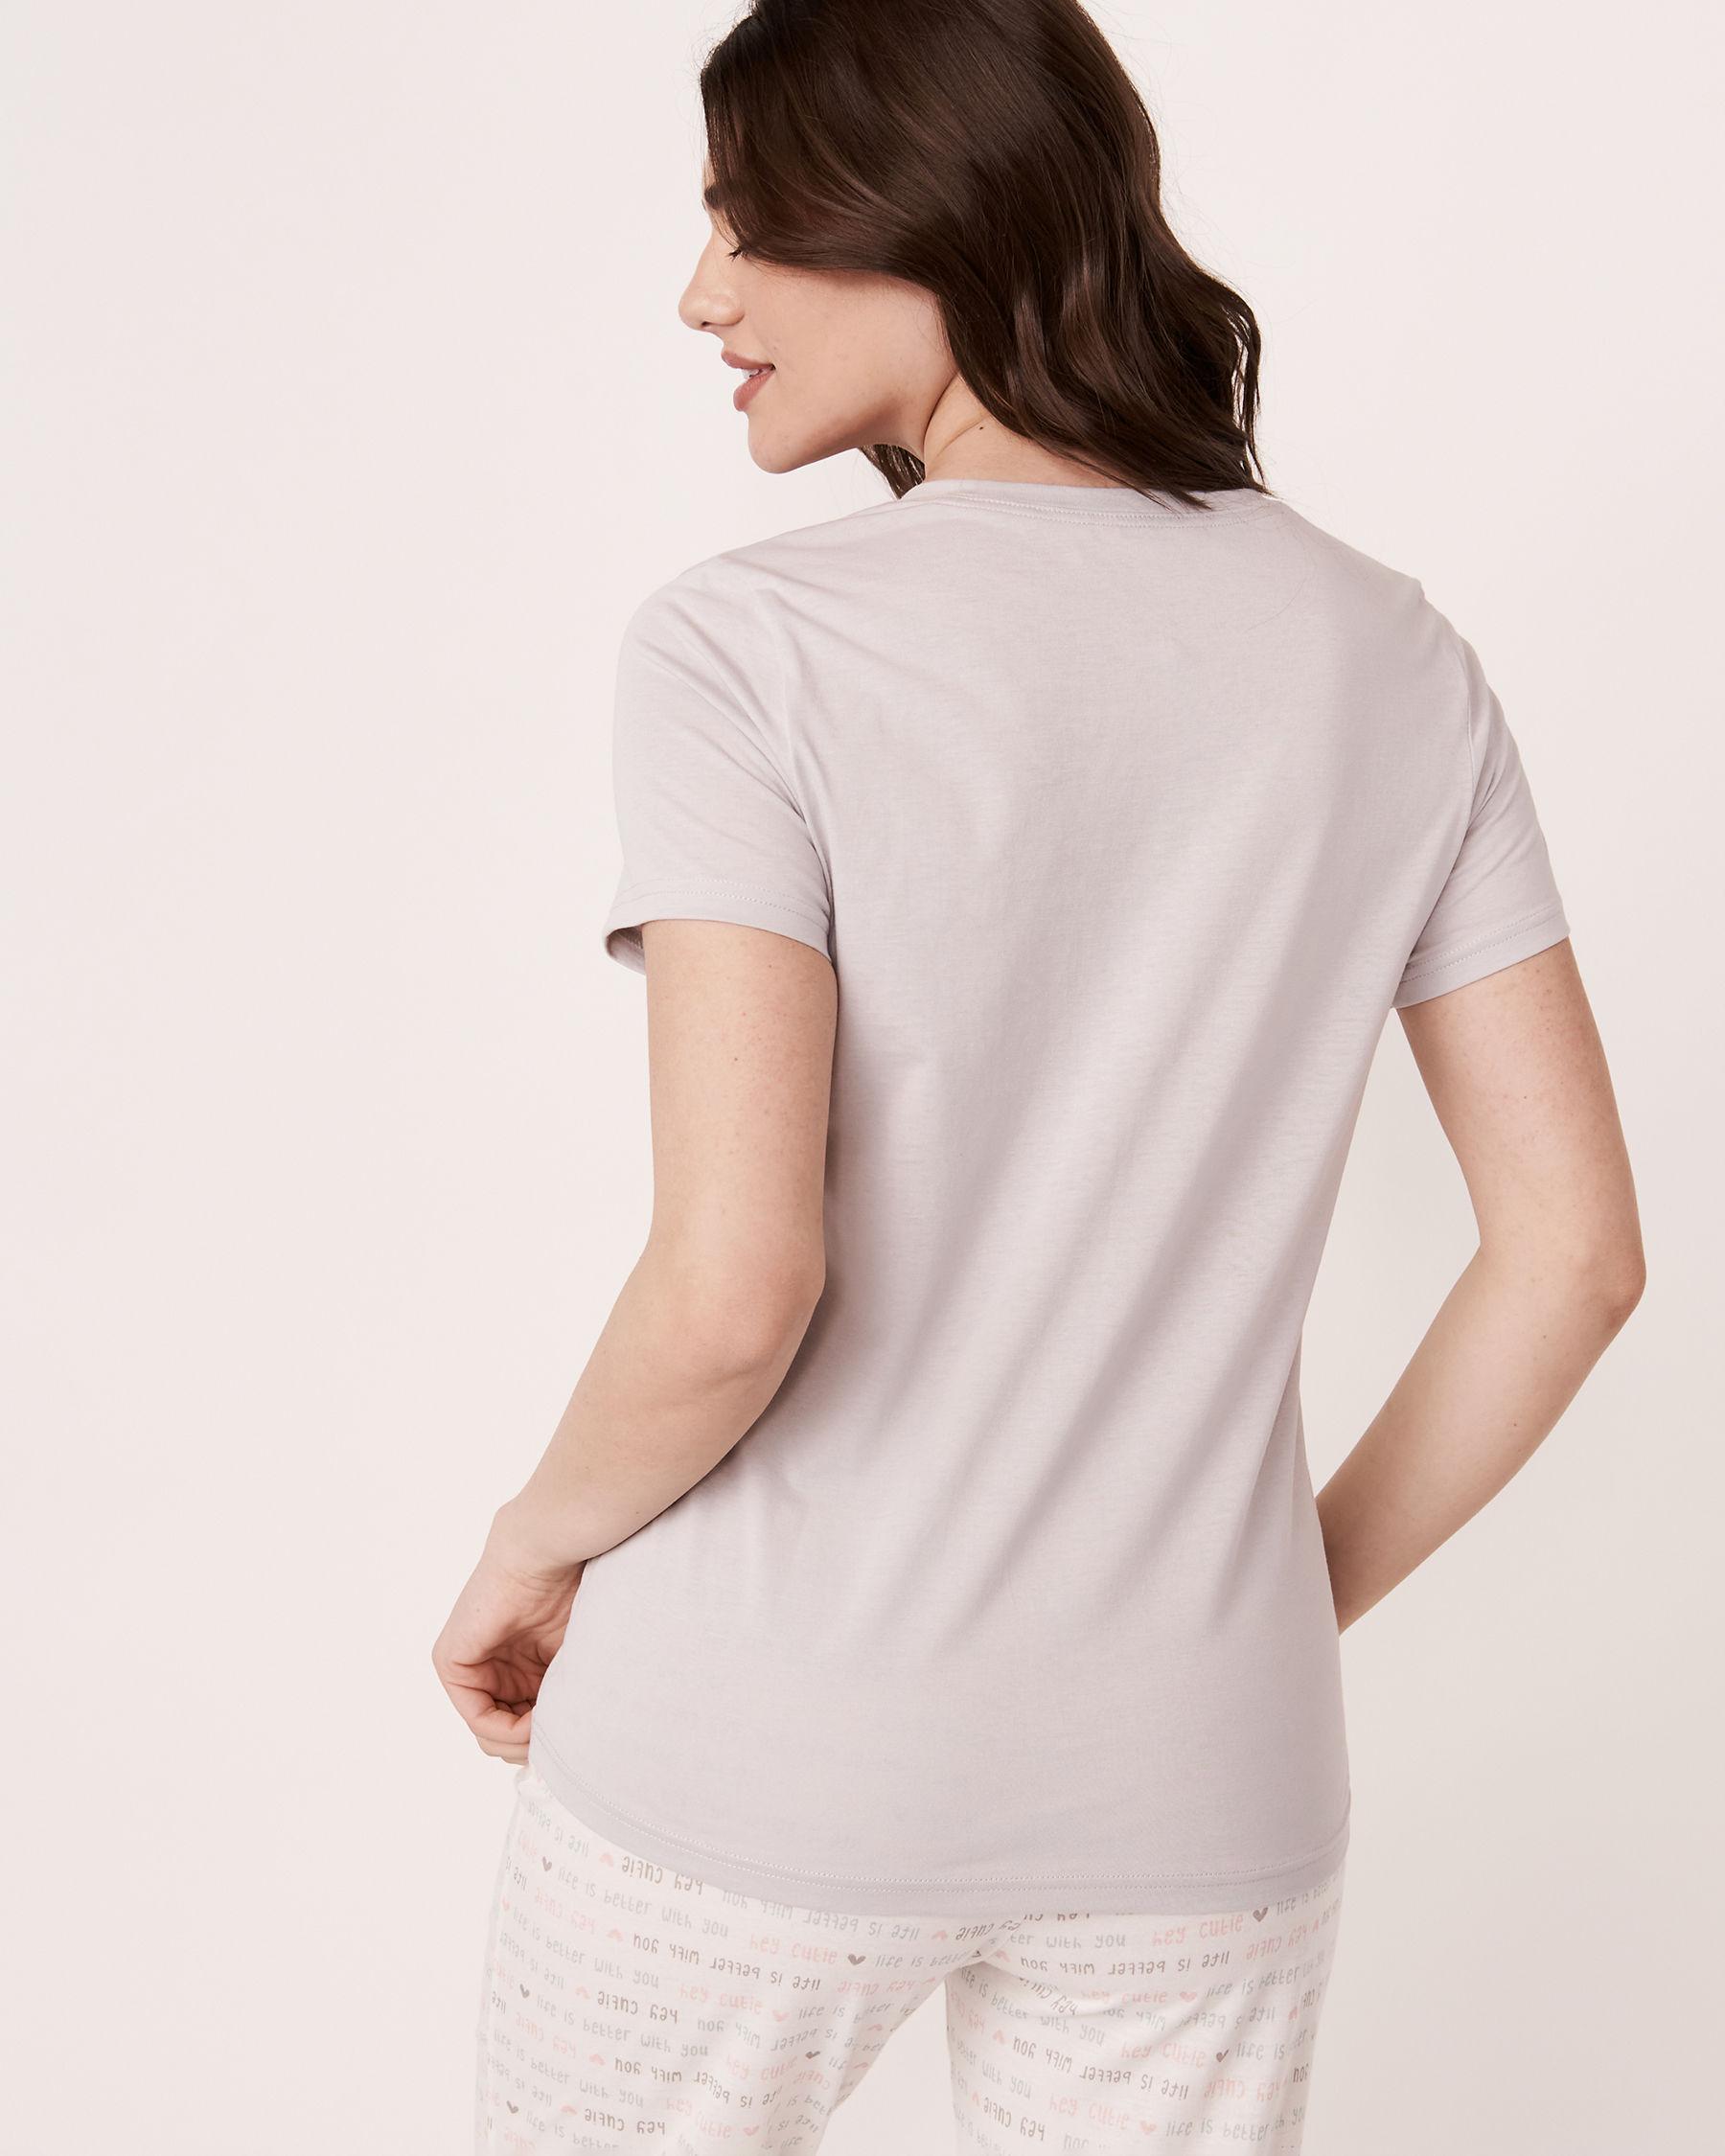 LA VIE EN ROSE Scoop Neck T-shirt Grey print 40100110 - View2